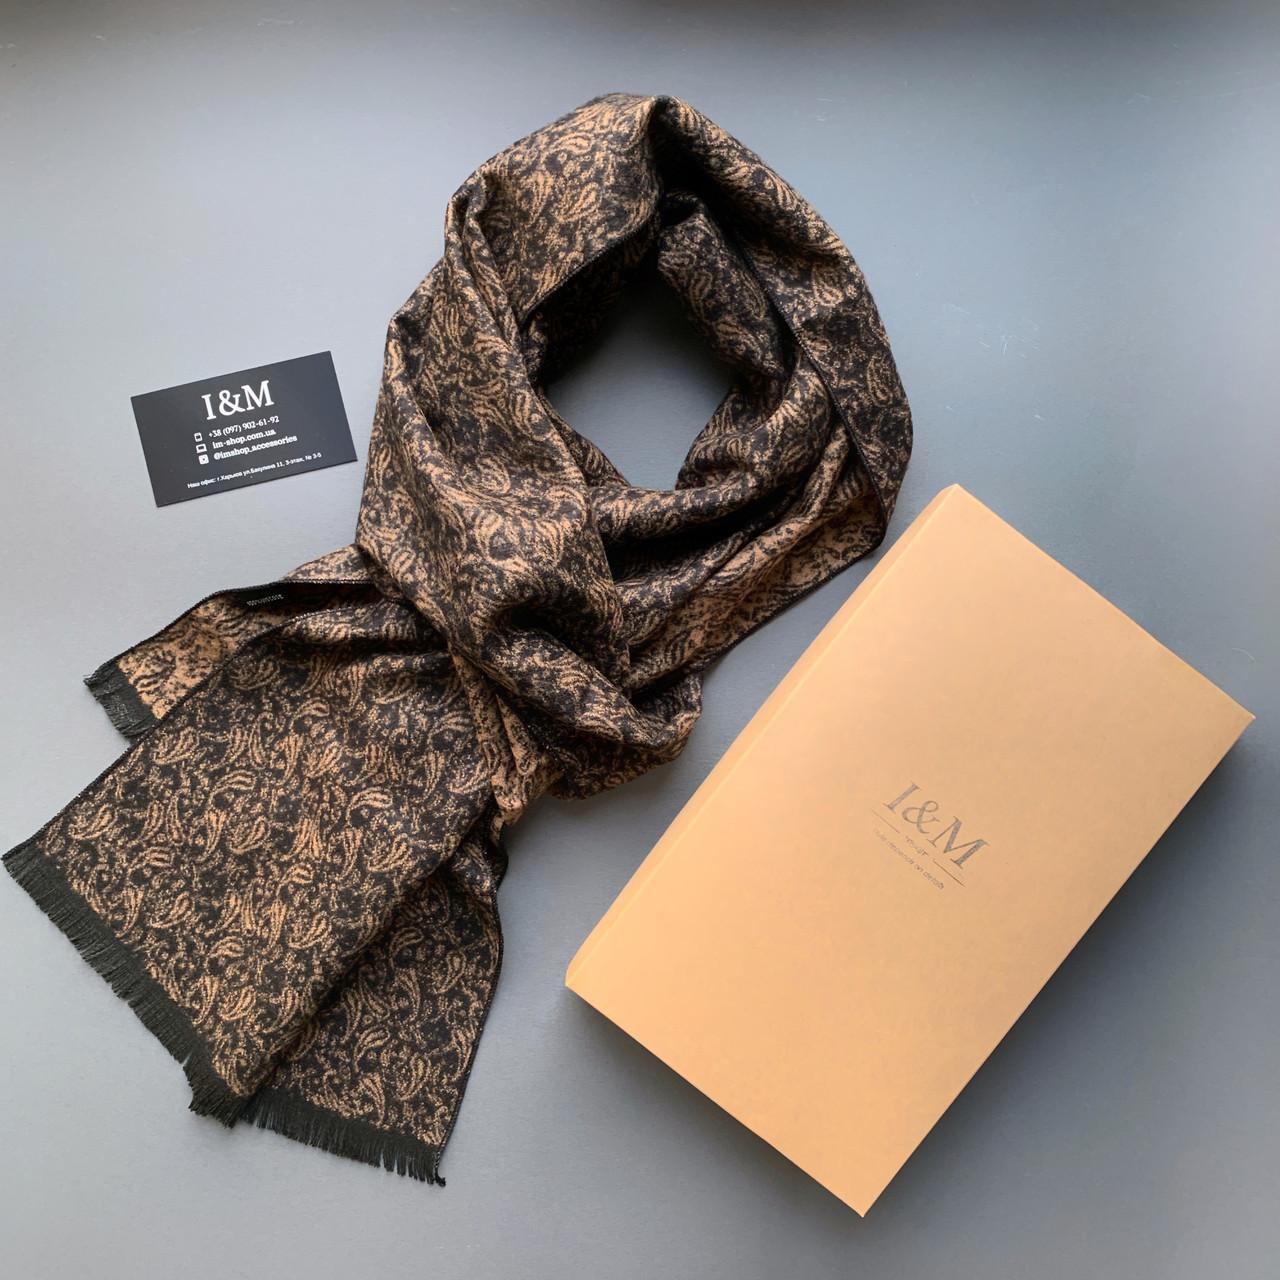 Шарф I&M Craft чоловічий коричнево-золотий з принтом (090308)